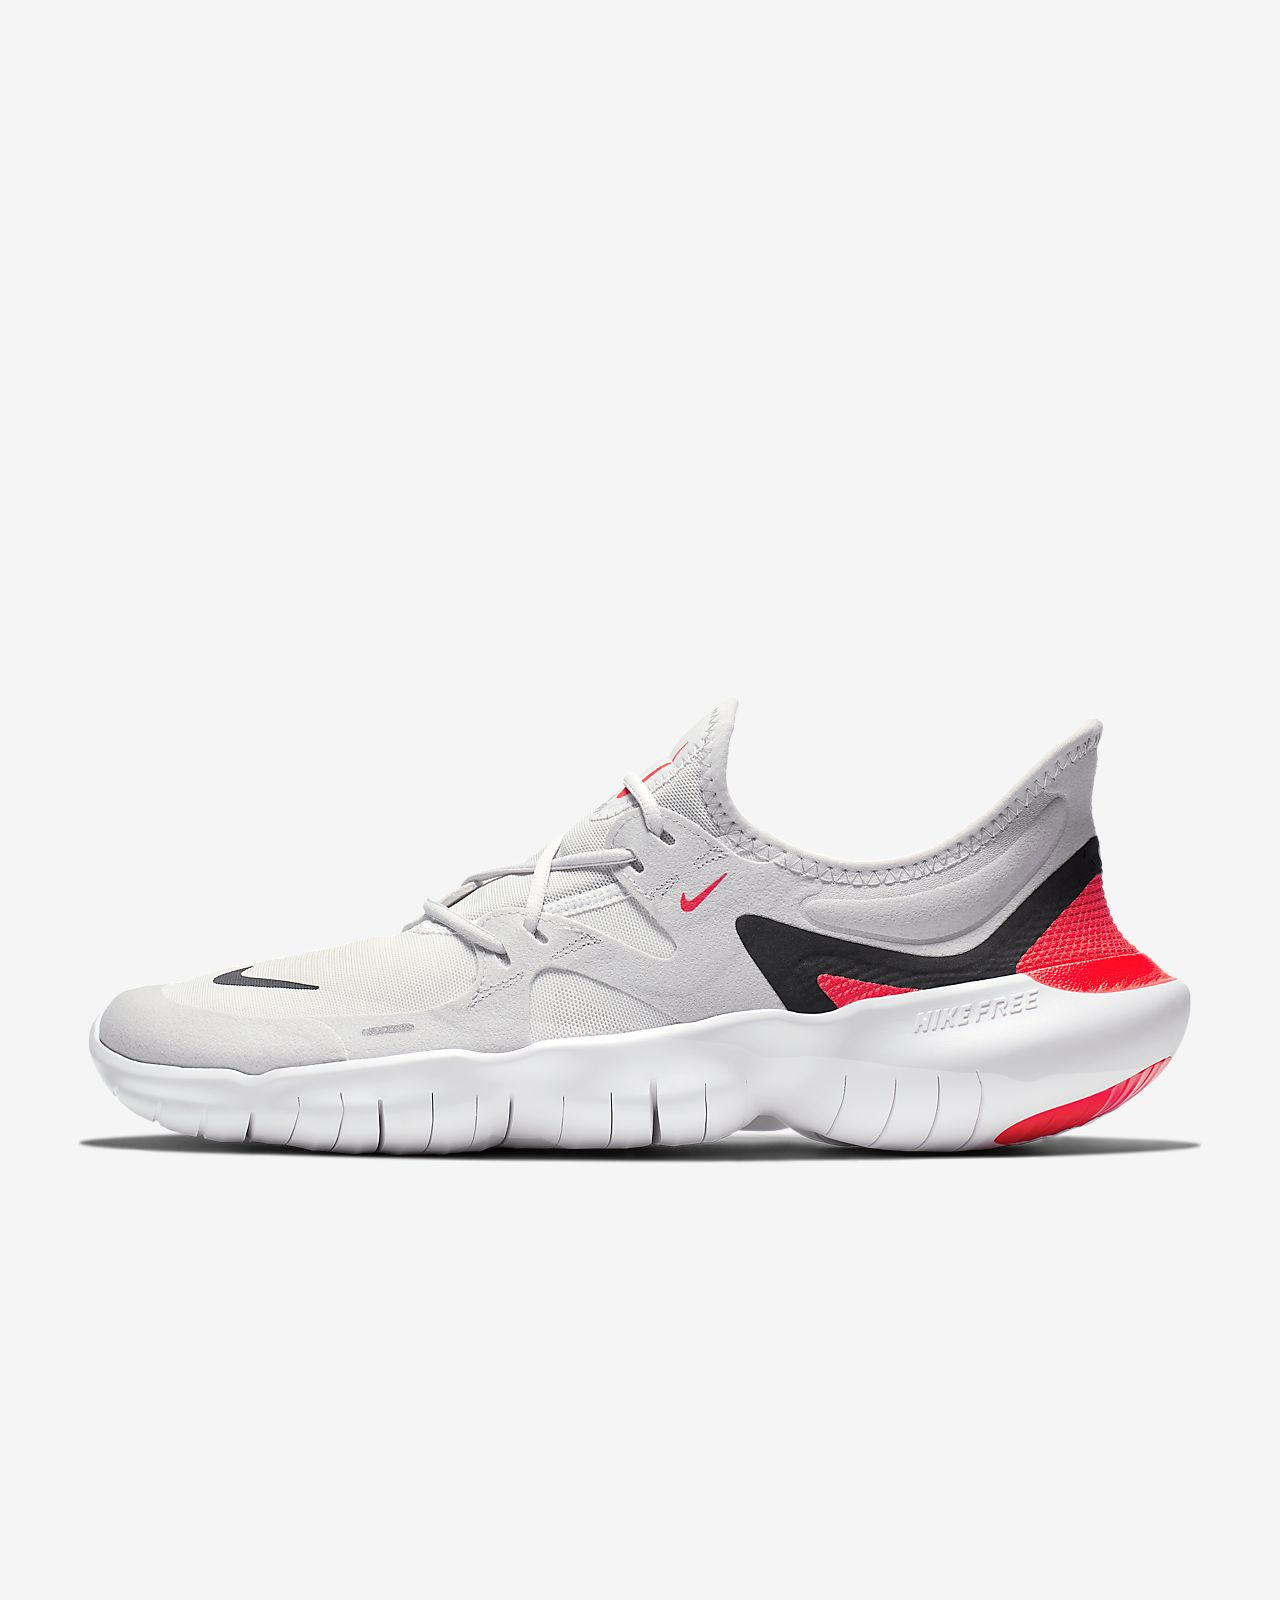 nike free 5.0 laufschuhe damen, Nike Free Run Sale, Nike